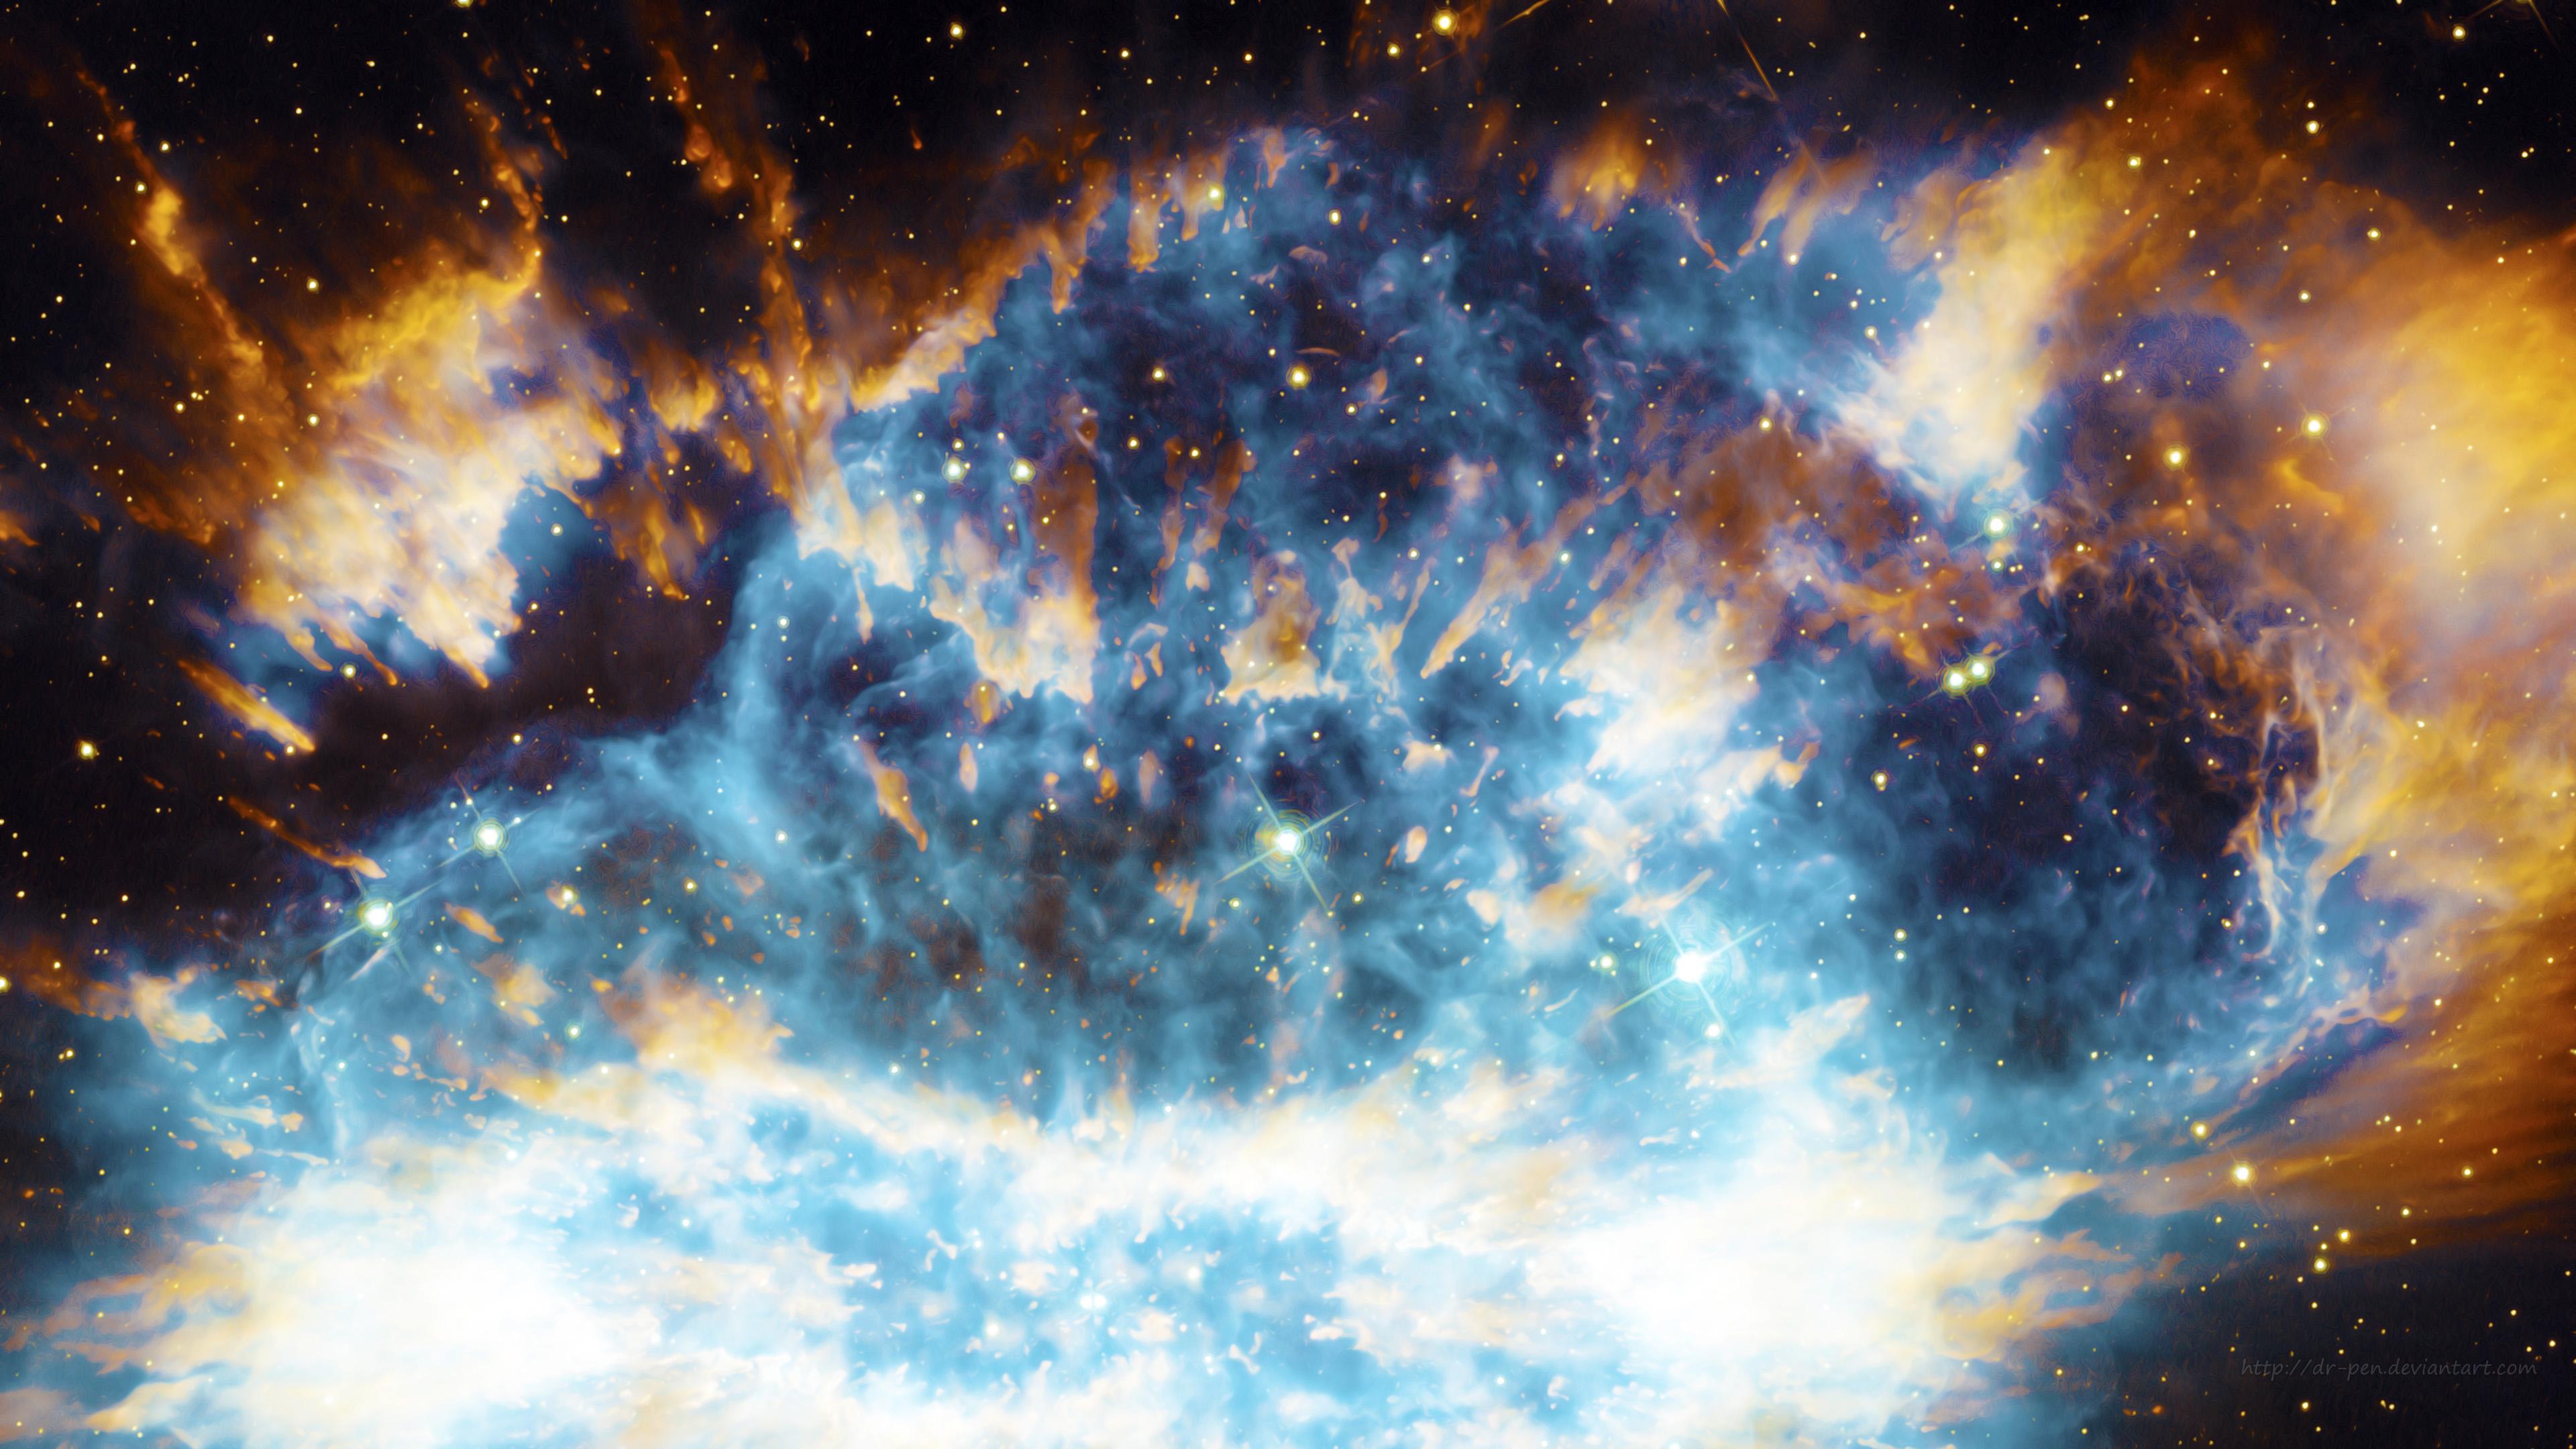 Stark blue nebula photomanipulated wallpaper 4k ultra hd wallpaper background image - Ultra 4k background images ...